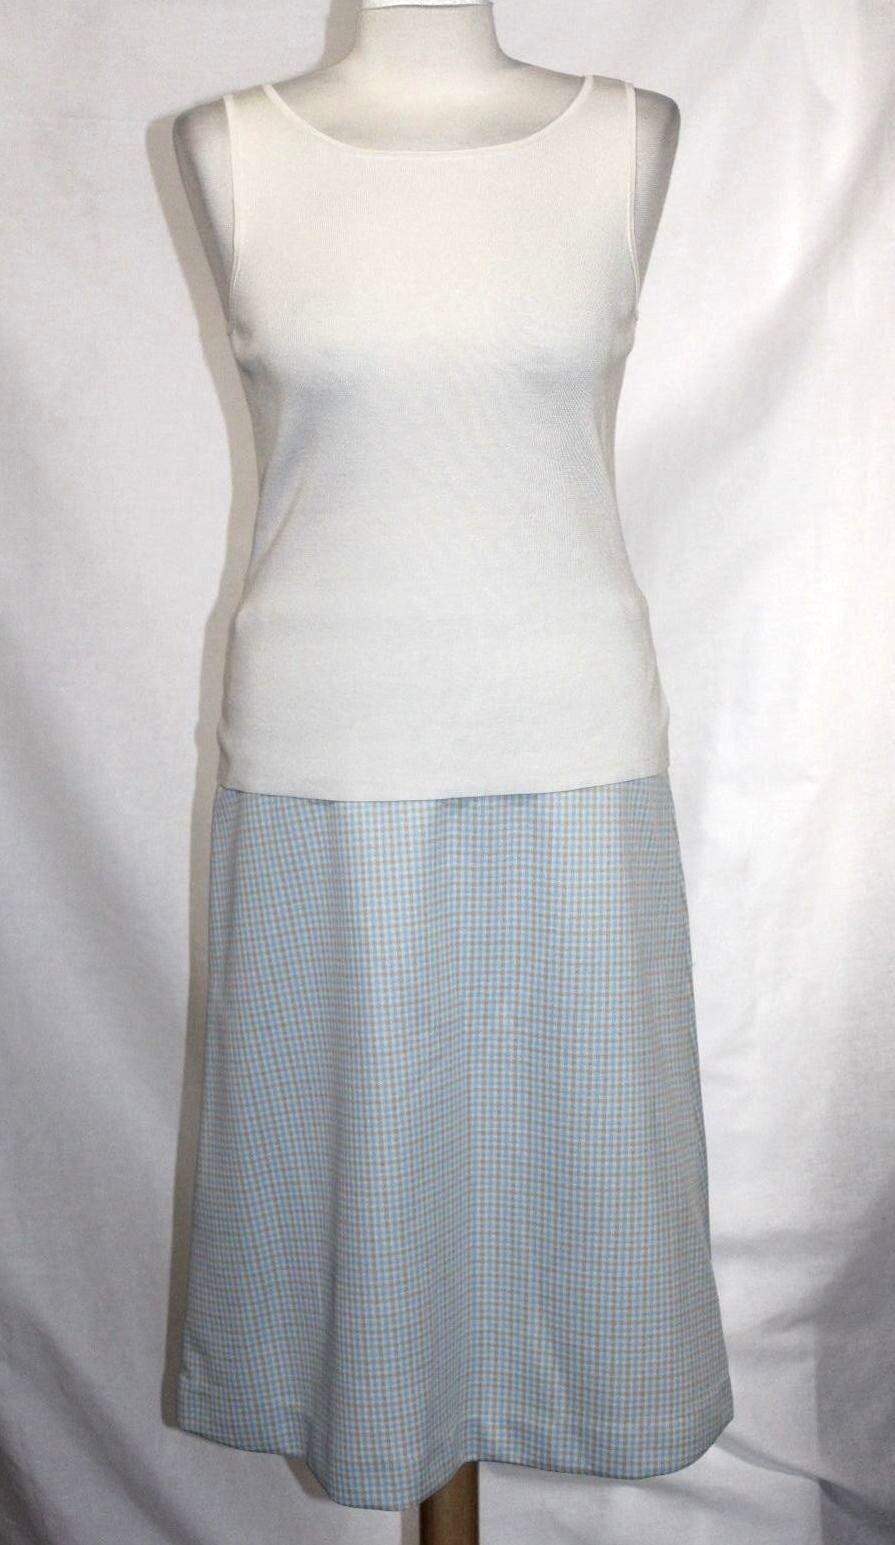 Vintage 60s - S M - MINT - bluee & Beige Plaid Polyester Below-Knee A-Line Skirt